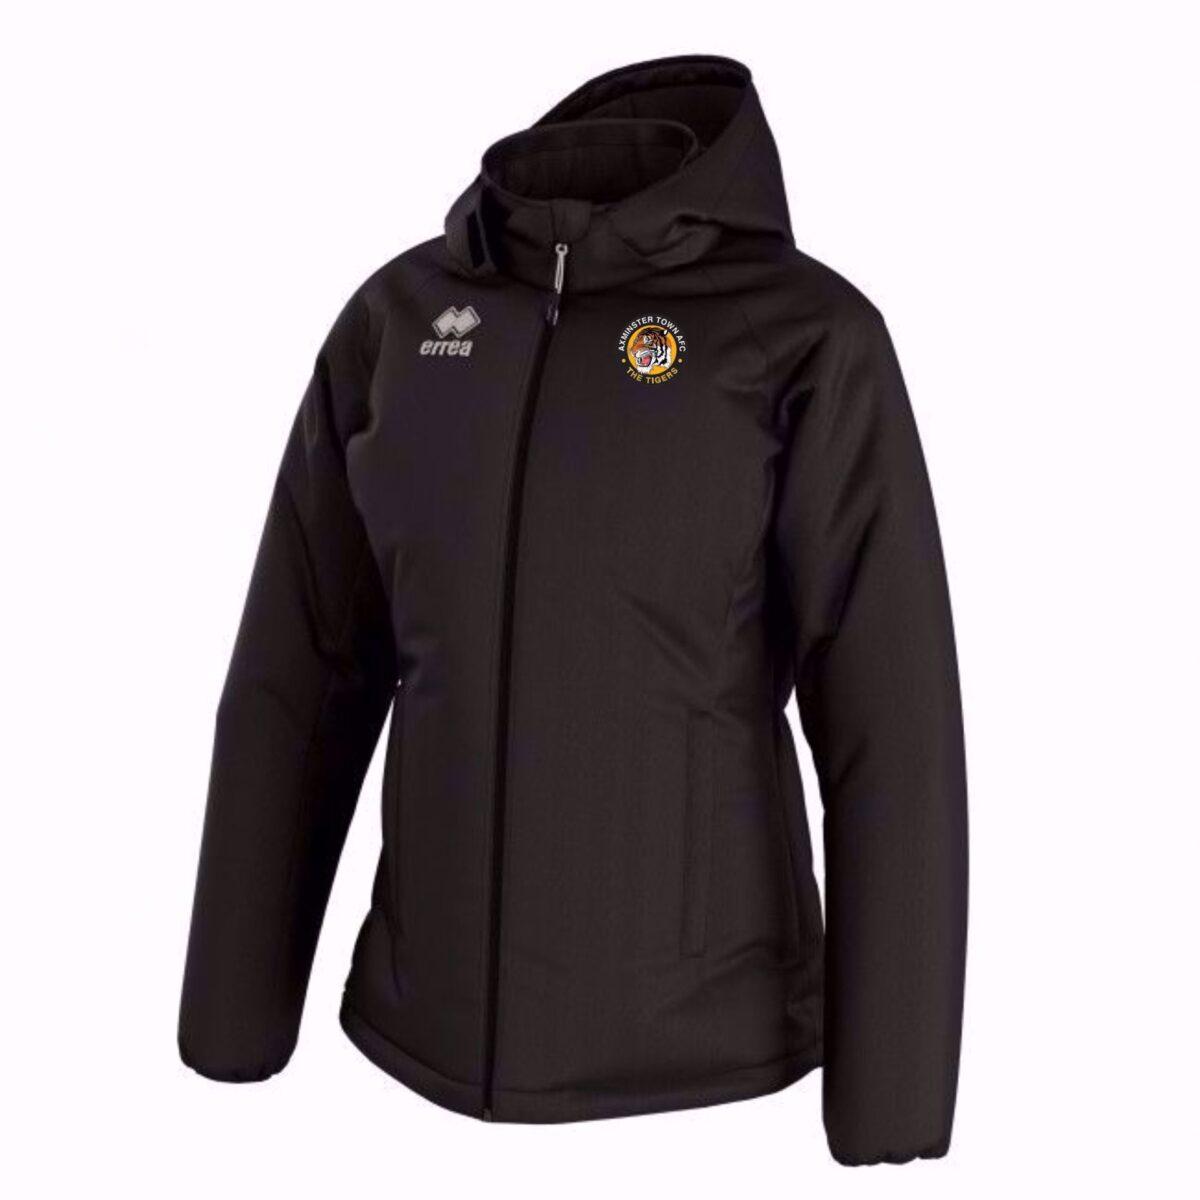 Axminster Town AFC Errea Dalila Womens Jacket